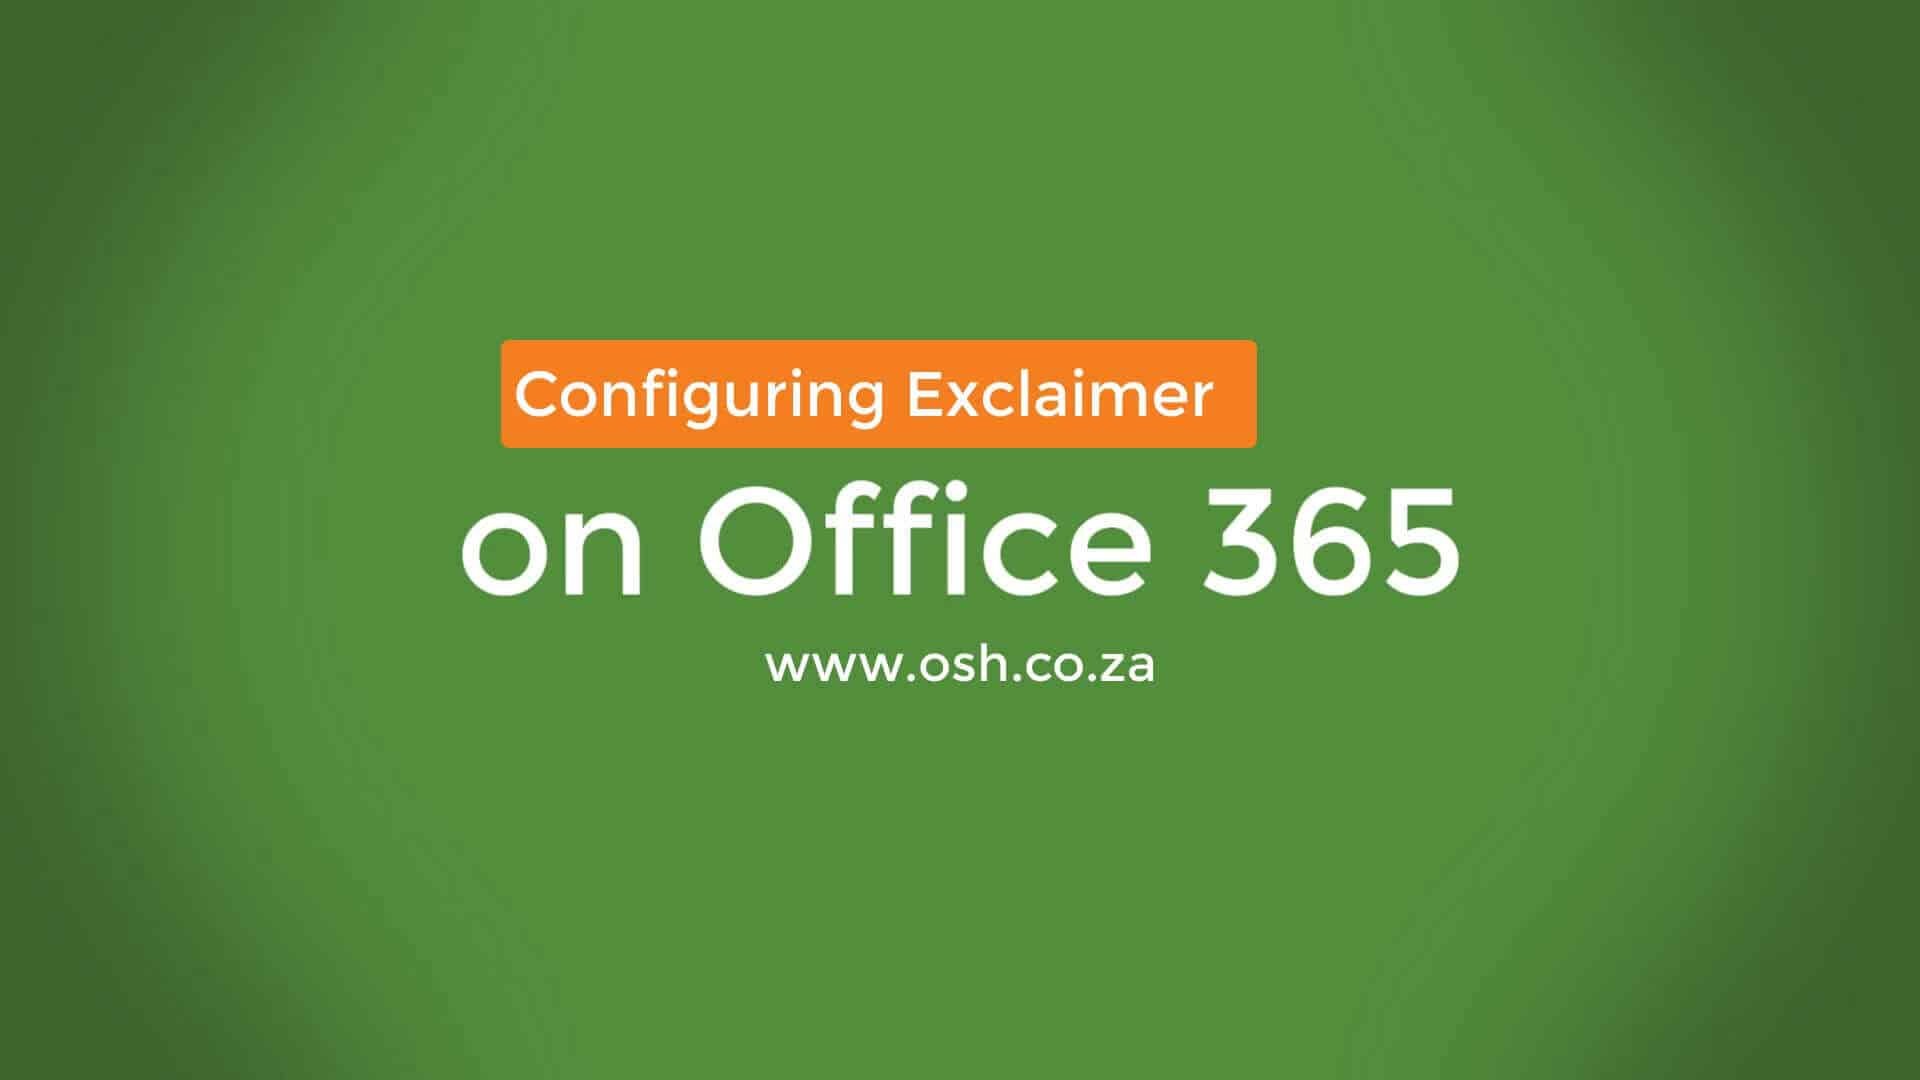 Exclaimer setup on Office 365